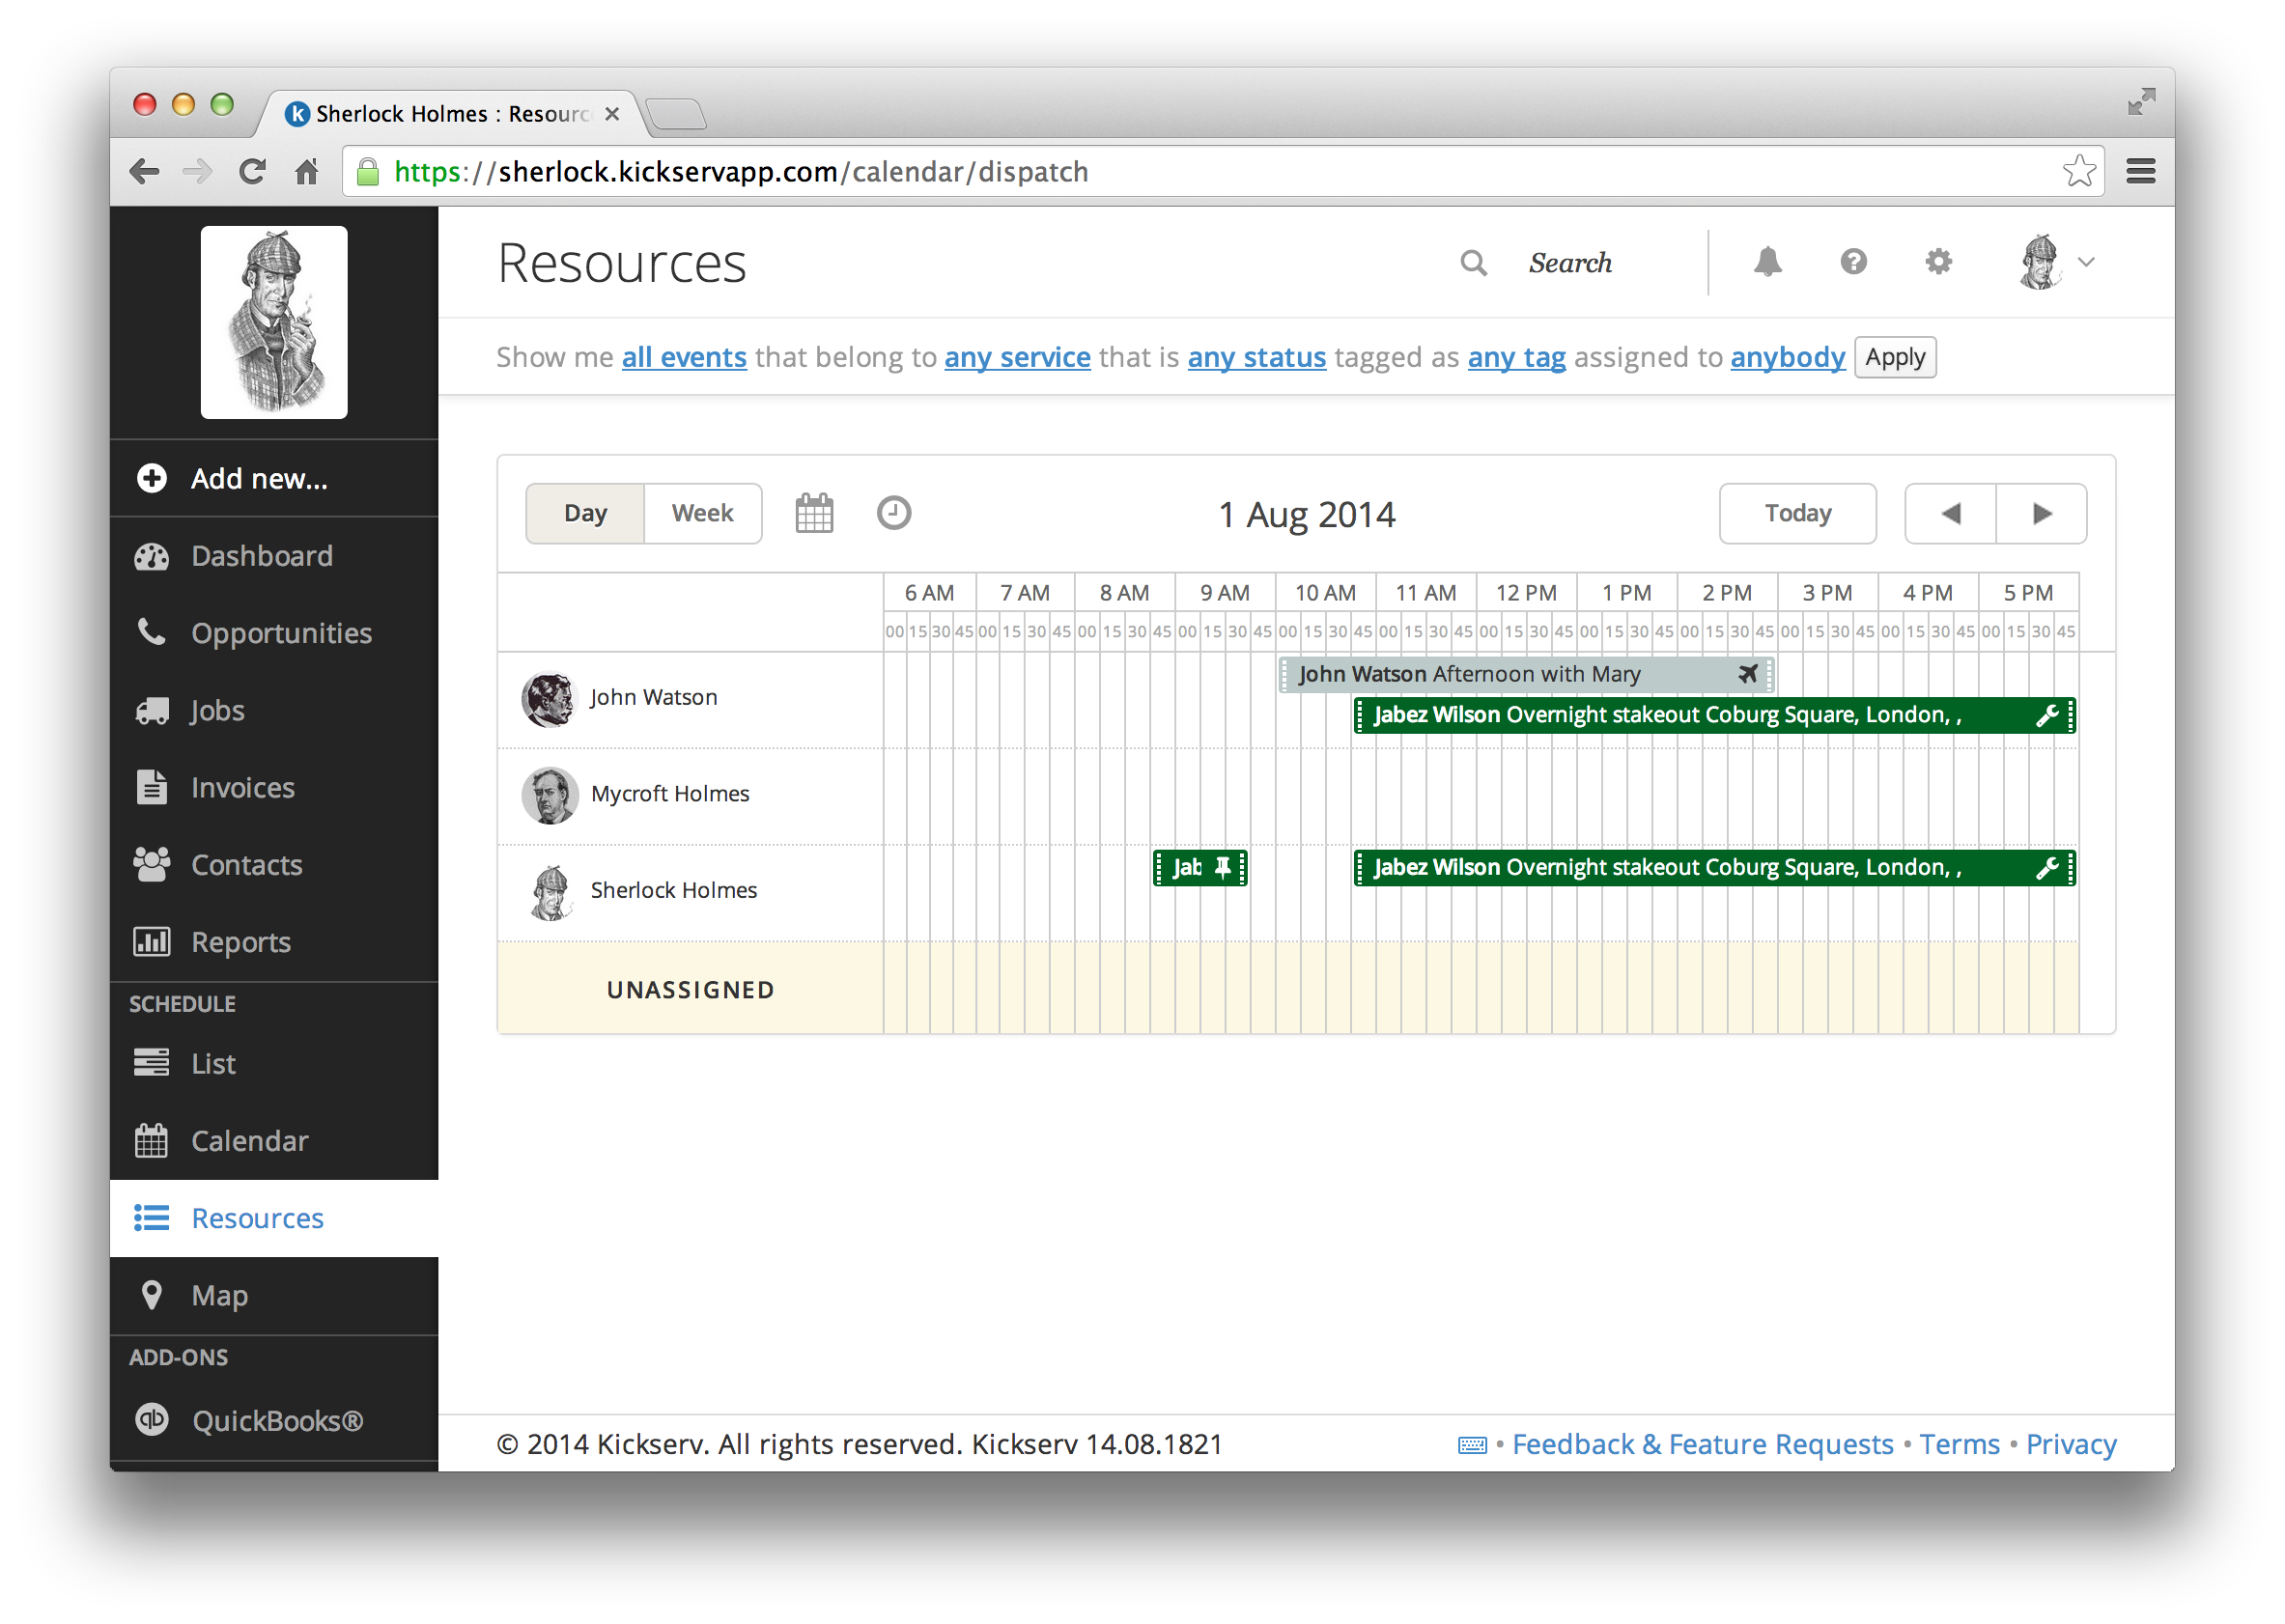 Kickserv Demo - Resources